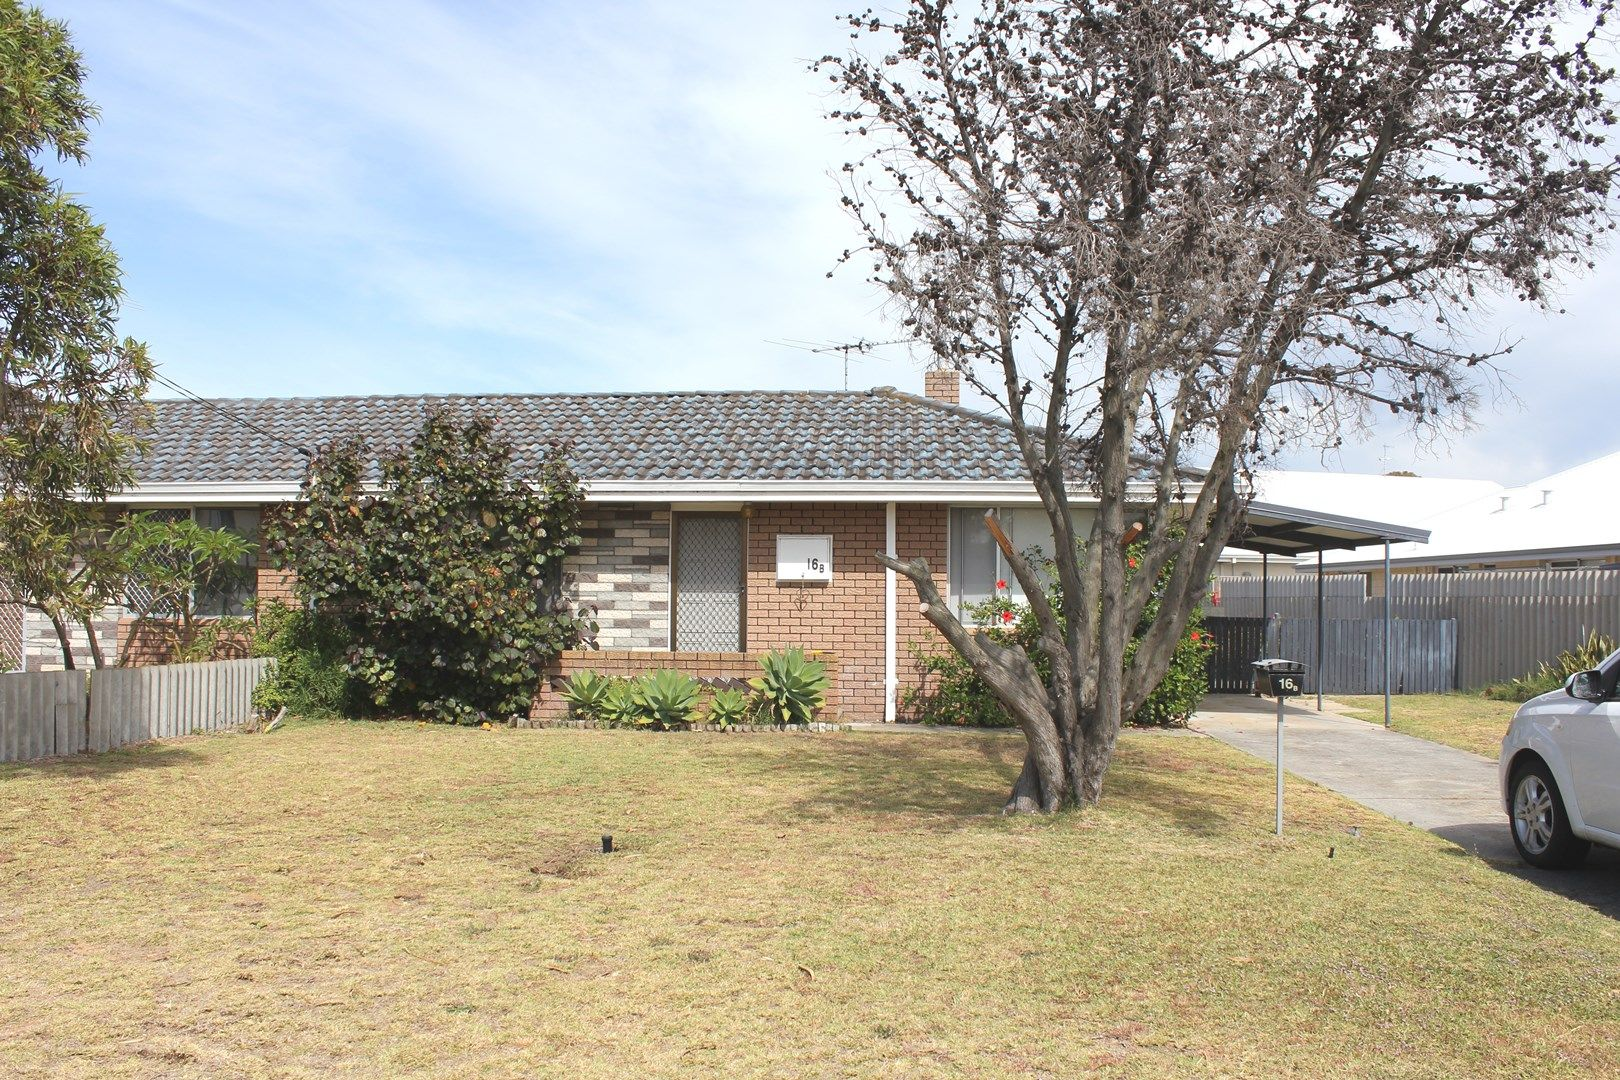 16 B Saunders Street, Safety Bay WA 6169, Image 2